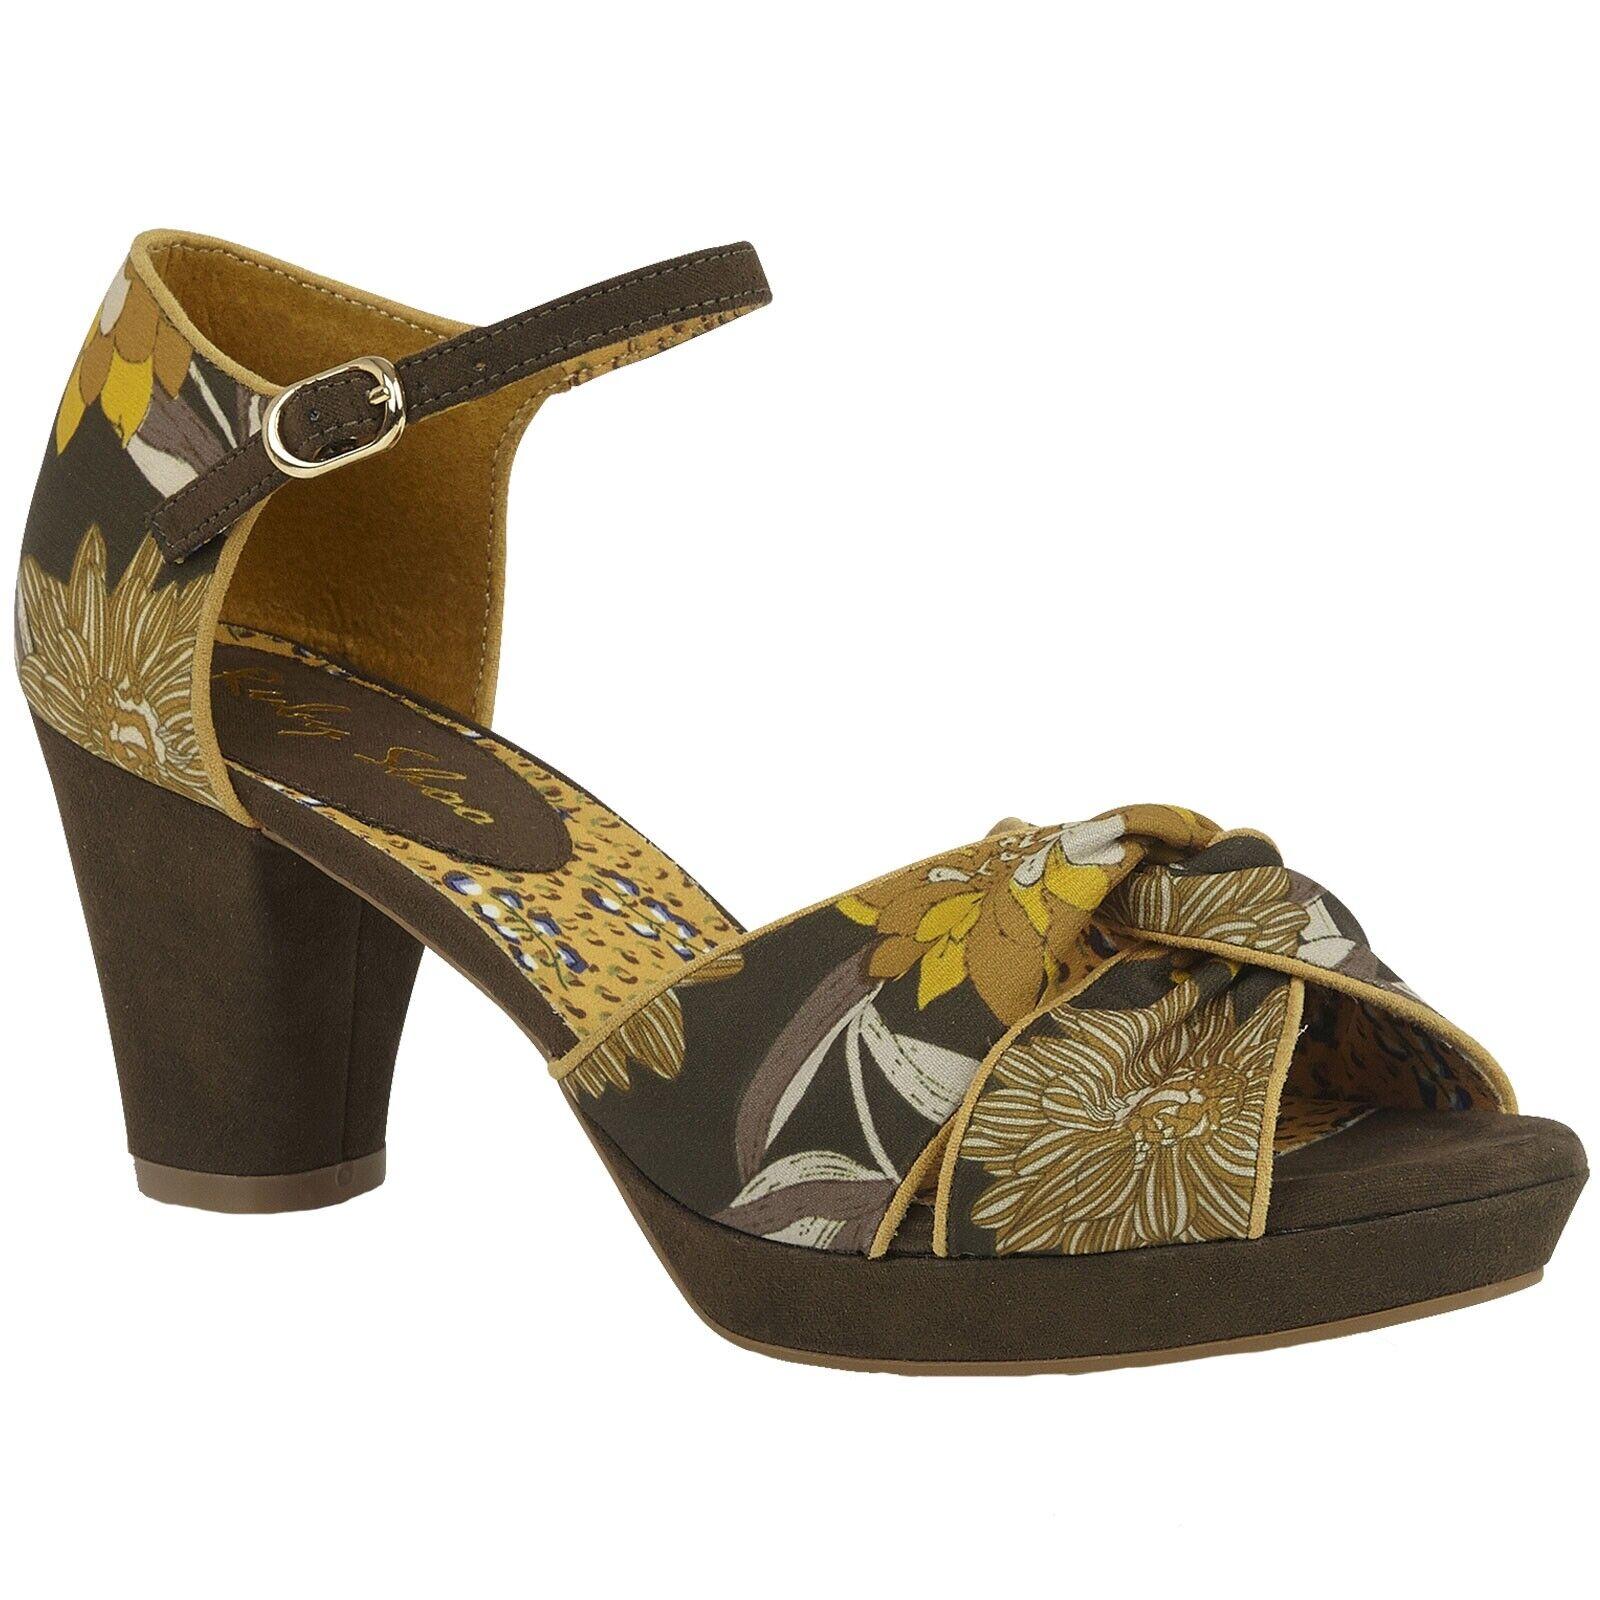 Femmes Ruby Shoo Xanthe Olive Floral Plateforme Peep Toe Vegan chaussures 09287